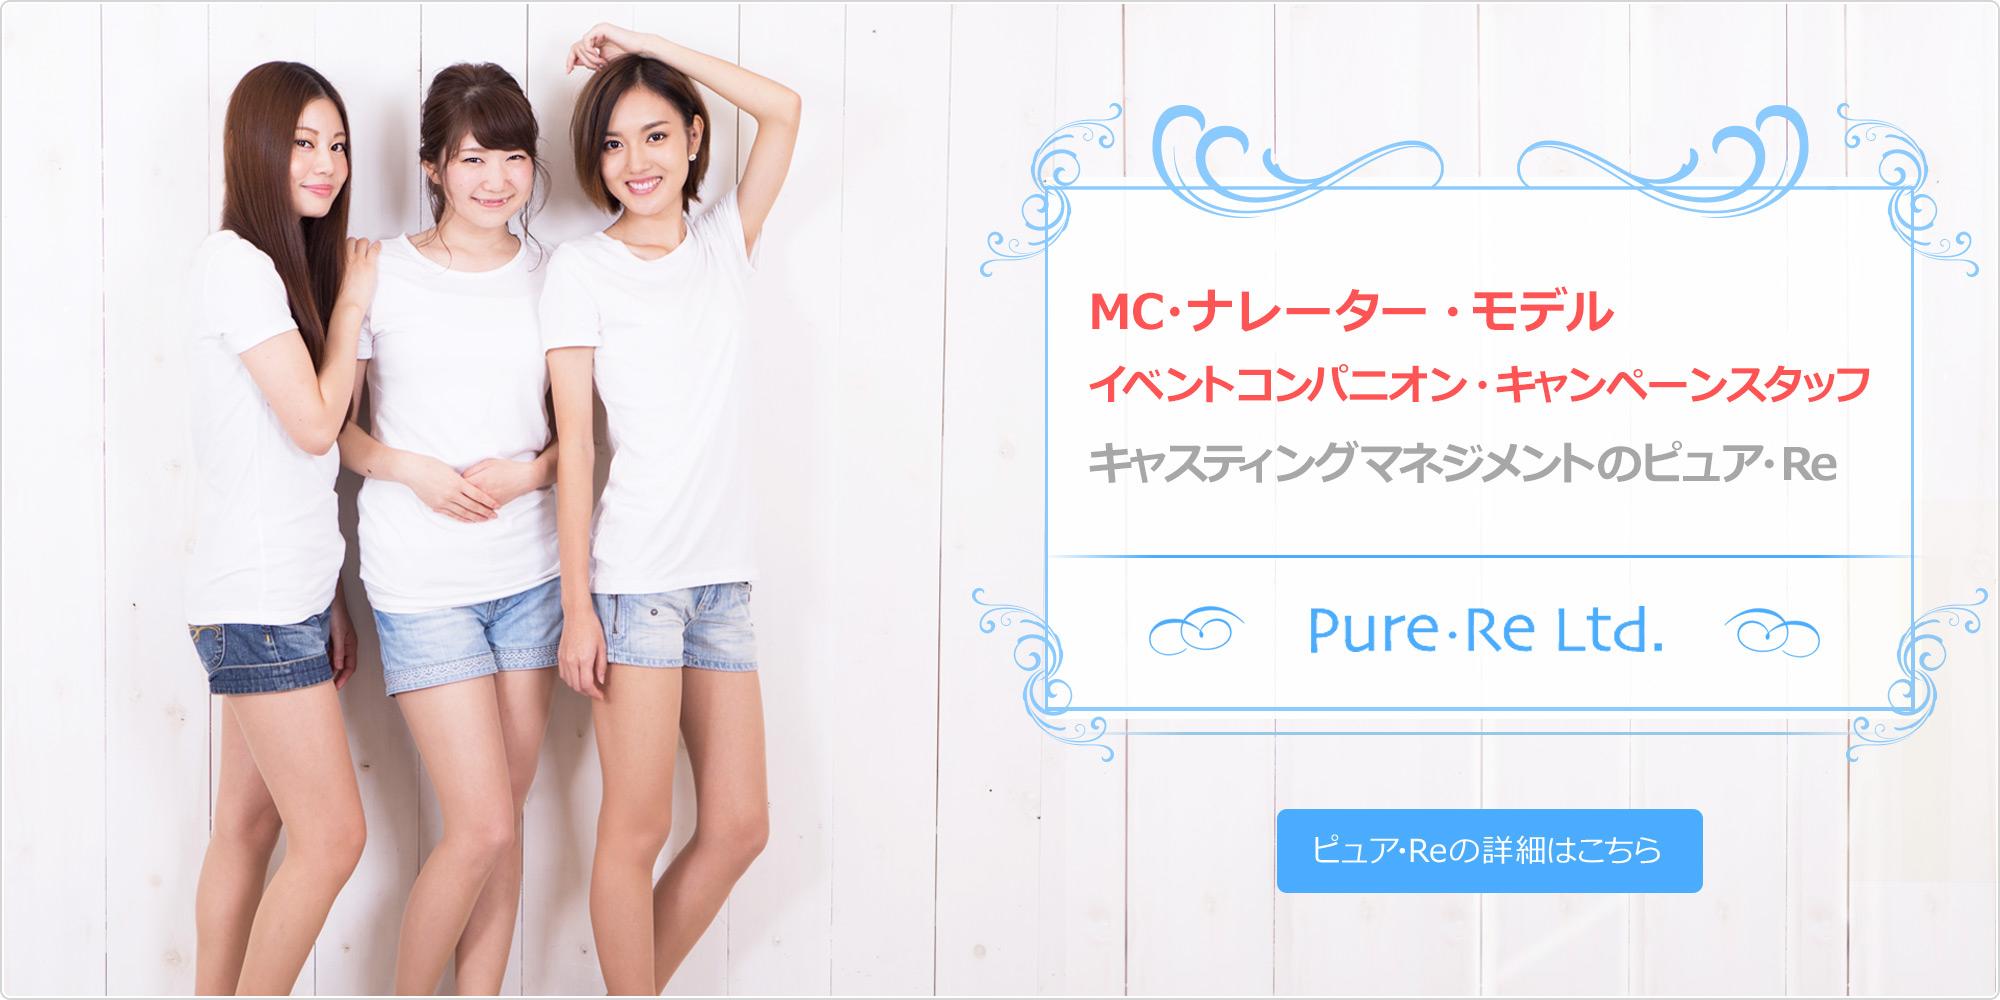 MC/ナレーター/モデル/イベントコンパニオン/キャンペーンスタッフ・キャスティングマネジメントのピュア・Re